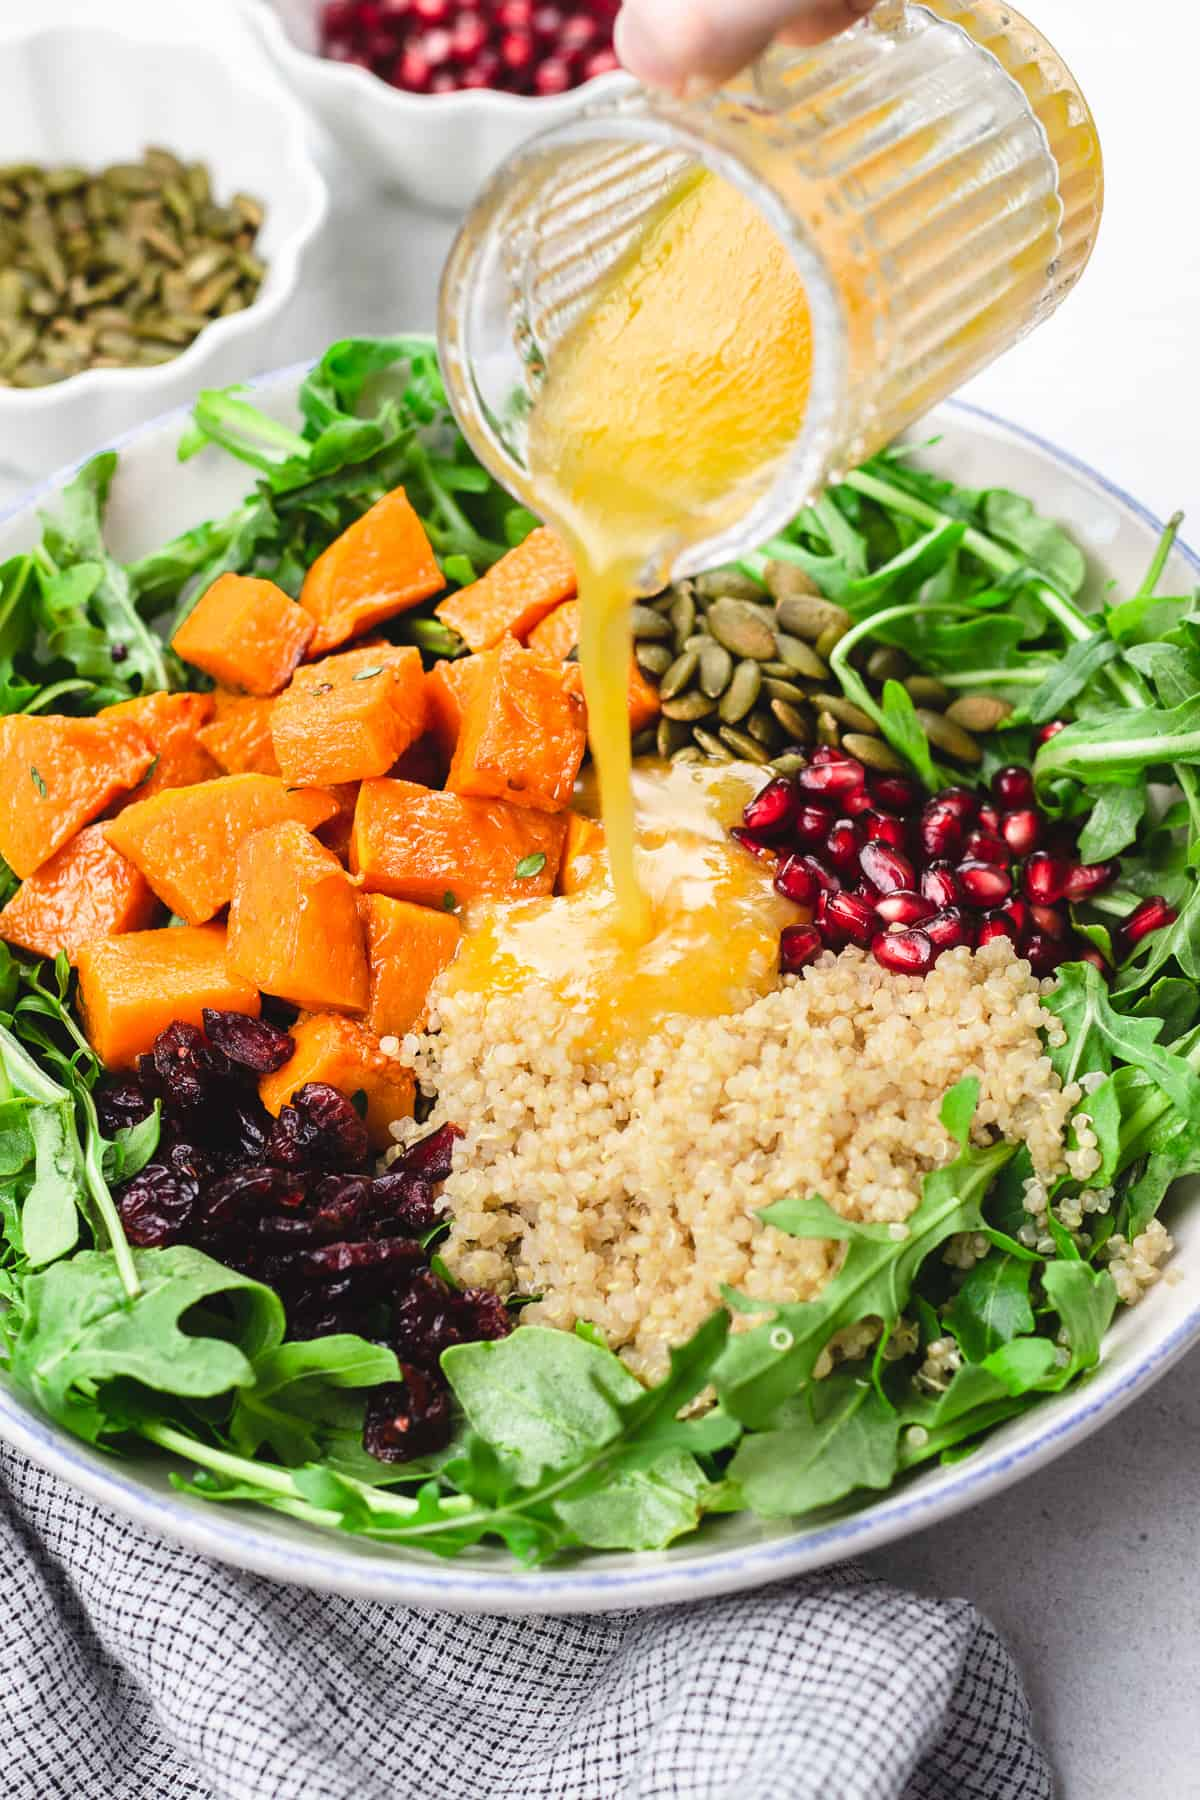 Pouring vinaigrette into a bowl with Butternut Squash Quinoa Salad.